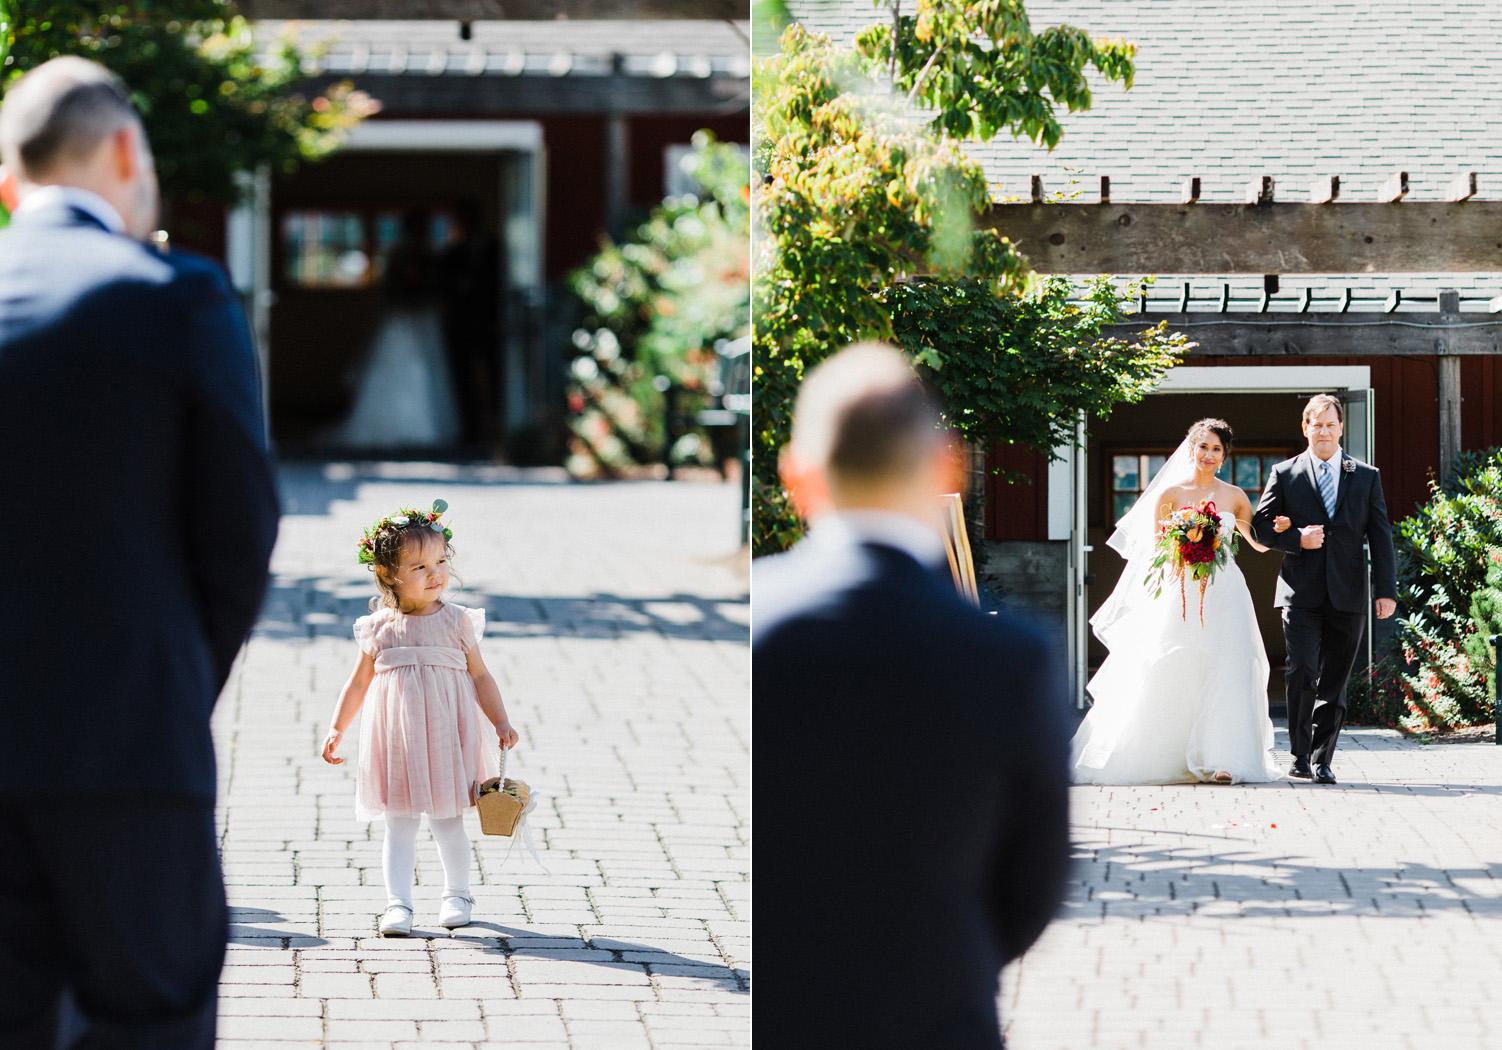 Pickering Barn Seattle Issaquah Outdoor Wedding Venue.jpg